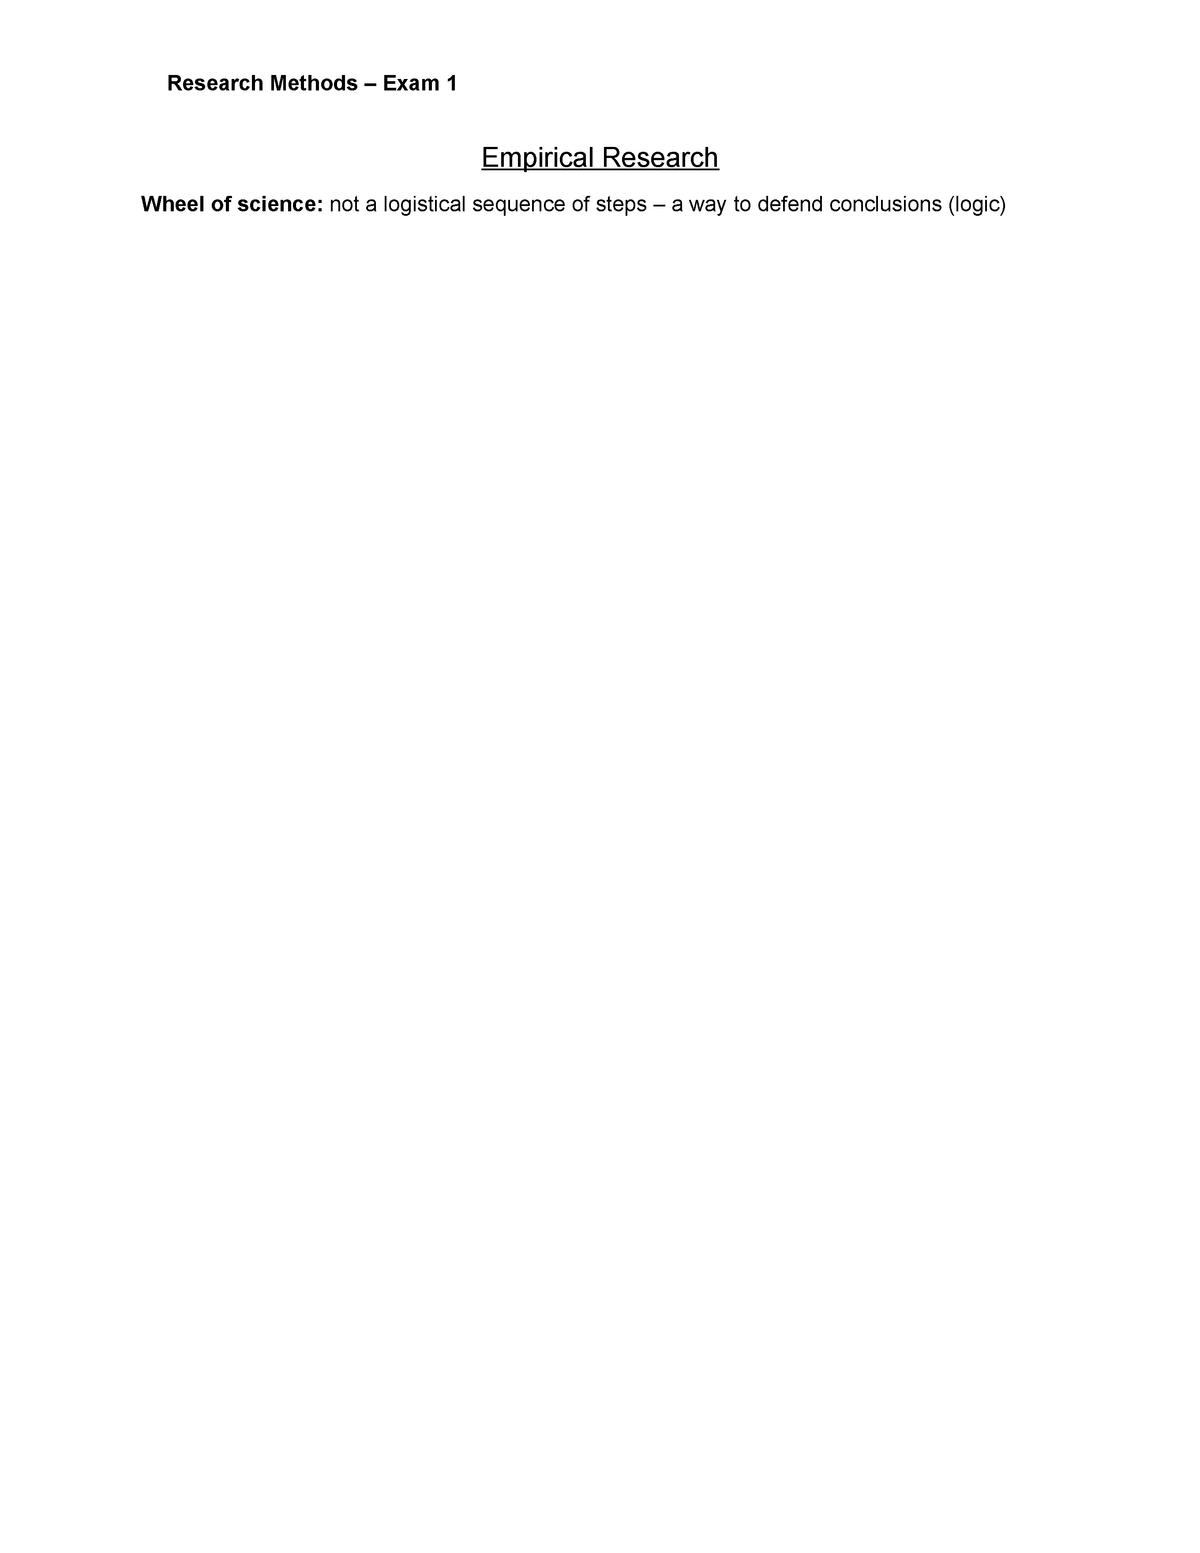 Research Methods Exam 1 - 201500146 - Universiteit Twente